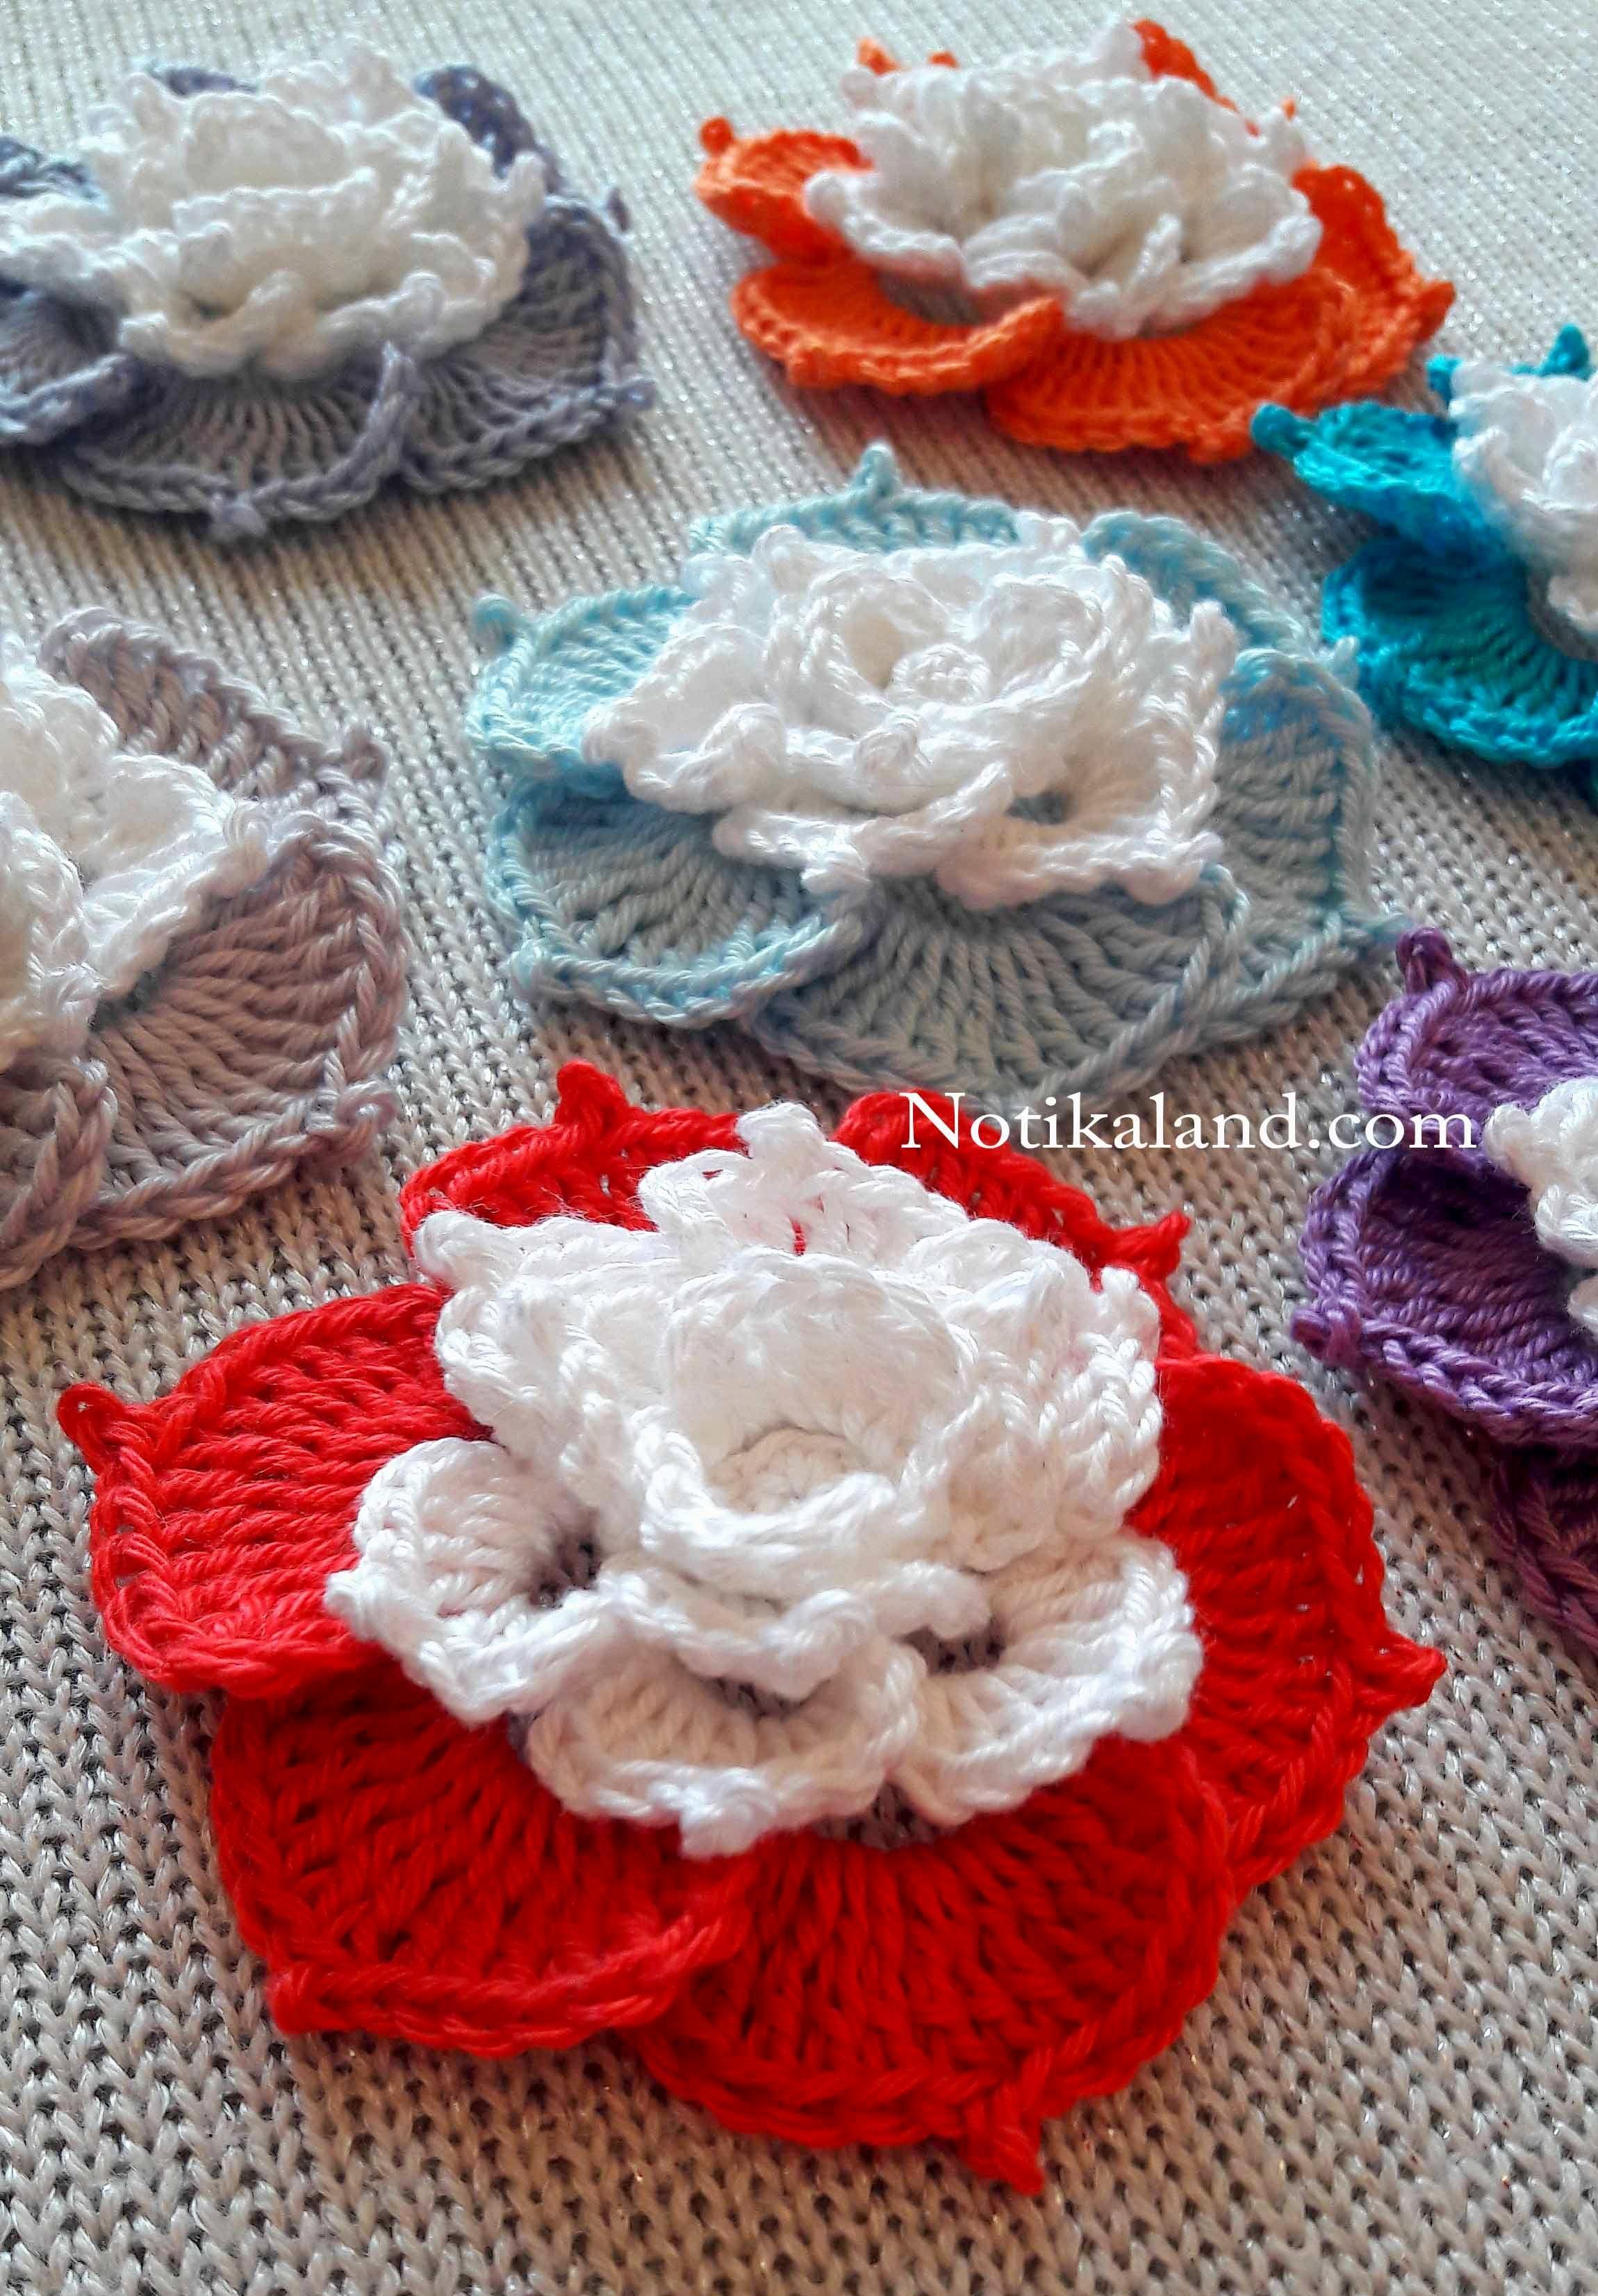 Pin de Marion en Amg/Cro/Knit | Pinterest | Flores, Flor y Ganchillo